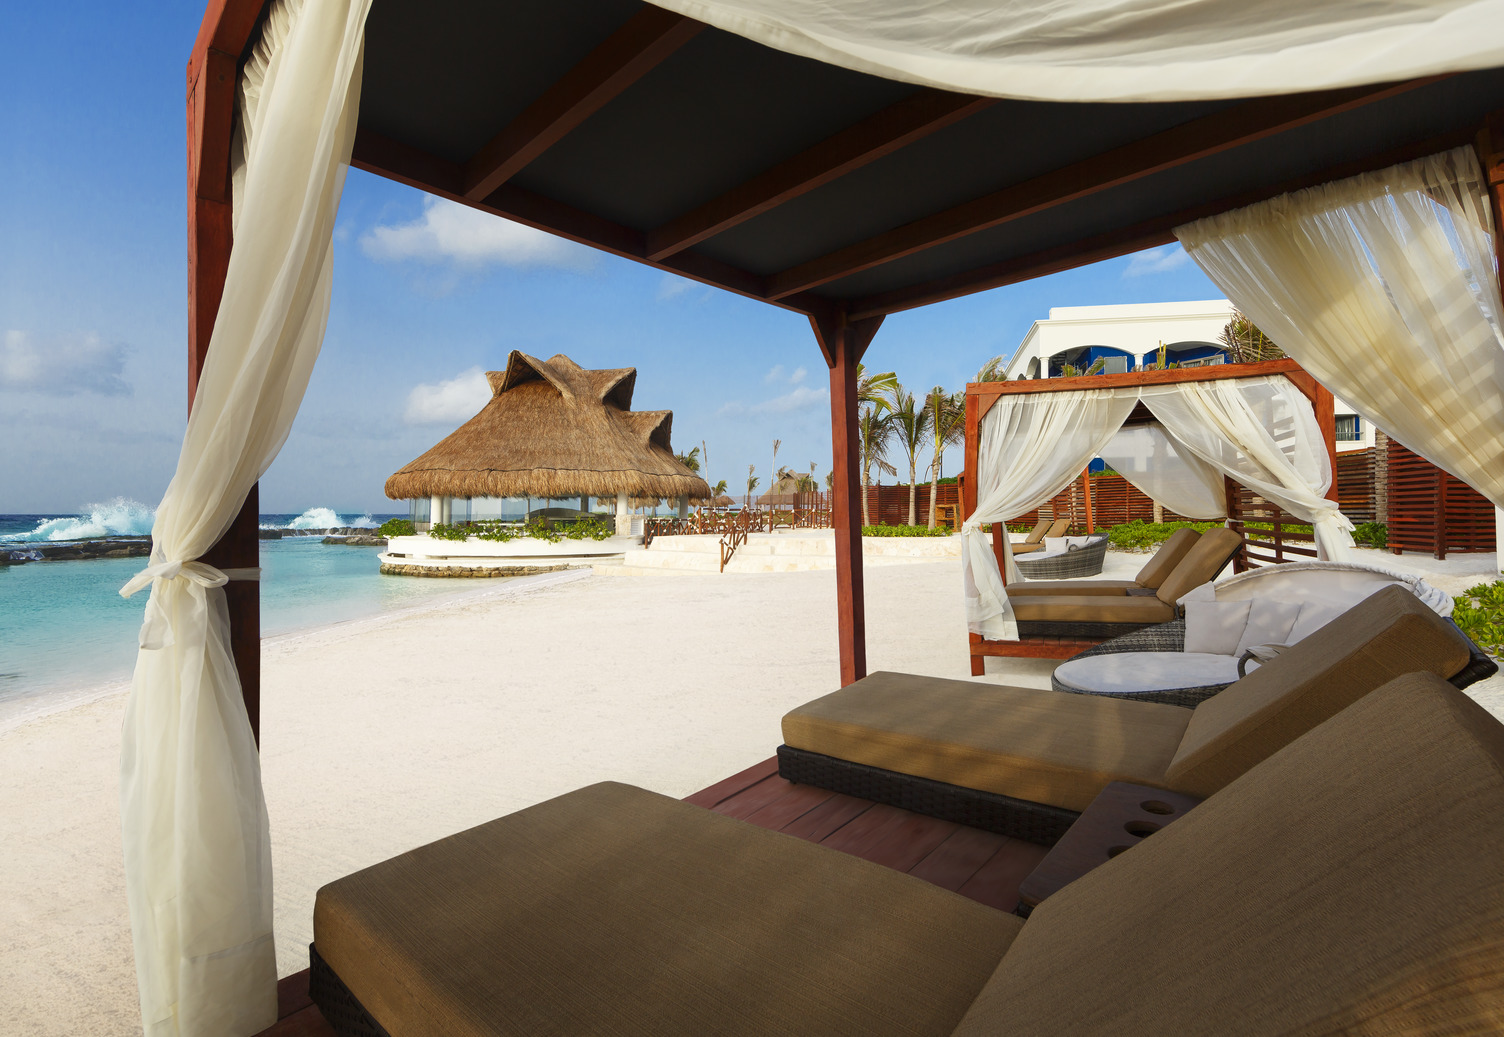 Travel Agency All-Inclusive Resort Heaven at Hard Rock Hotel Riviera Maya 12